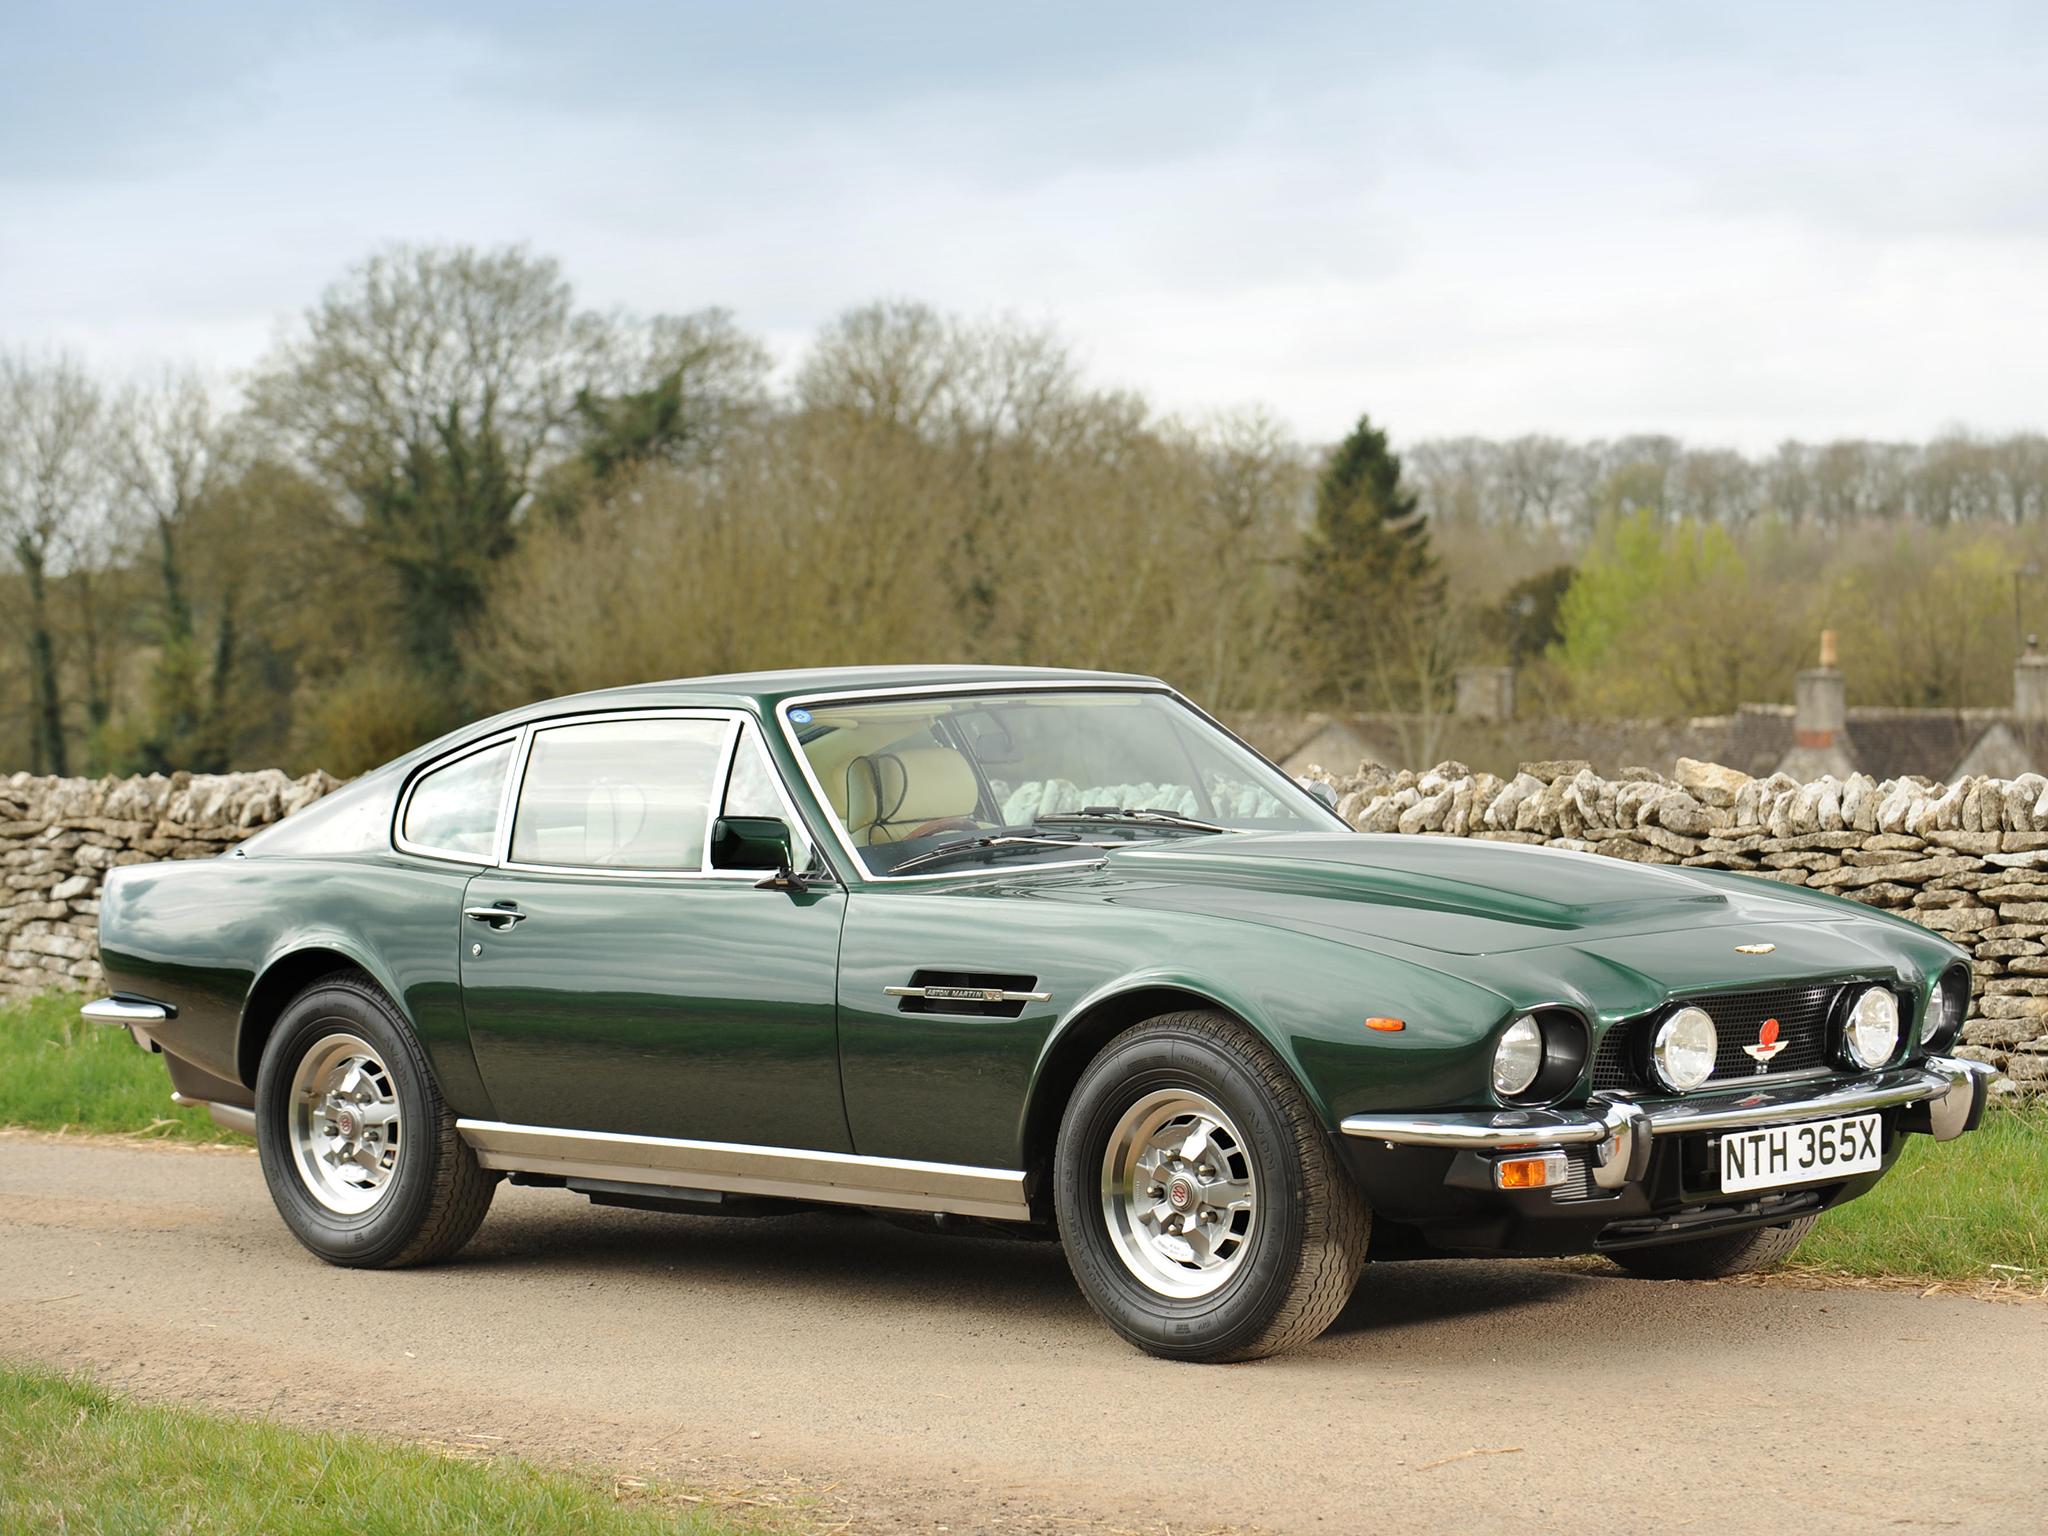 1977 Aston Martin V8 Vantage Uk Spec Muscle Supercar V 8 Gh Wallpaper 2048x1536 149138 Wallpaperup